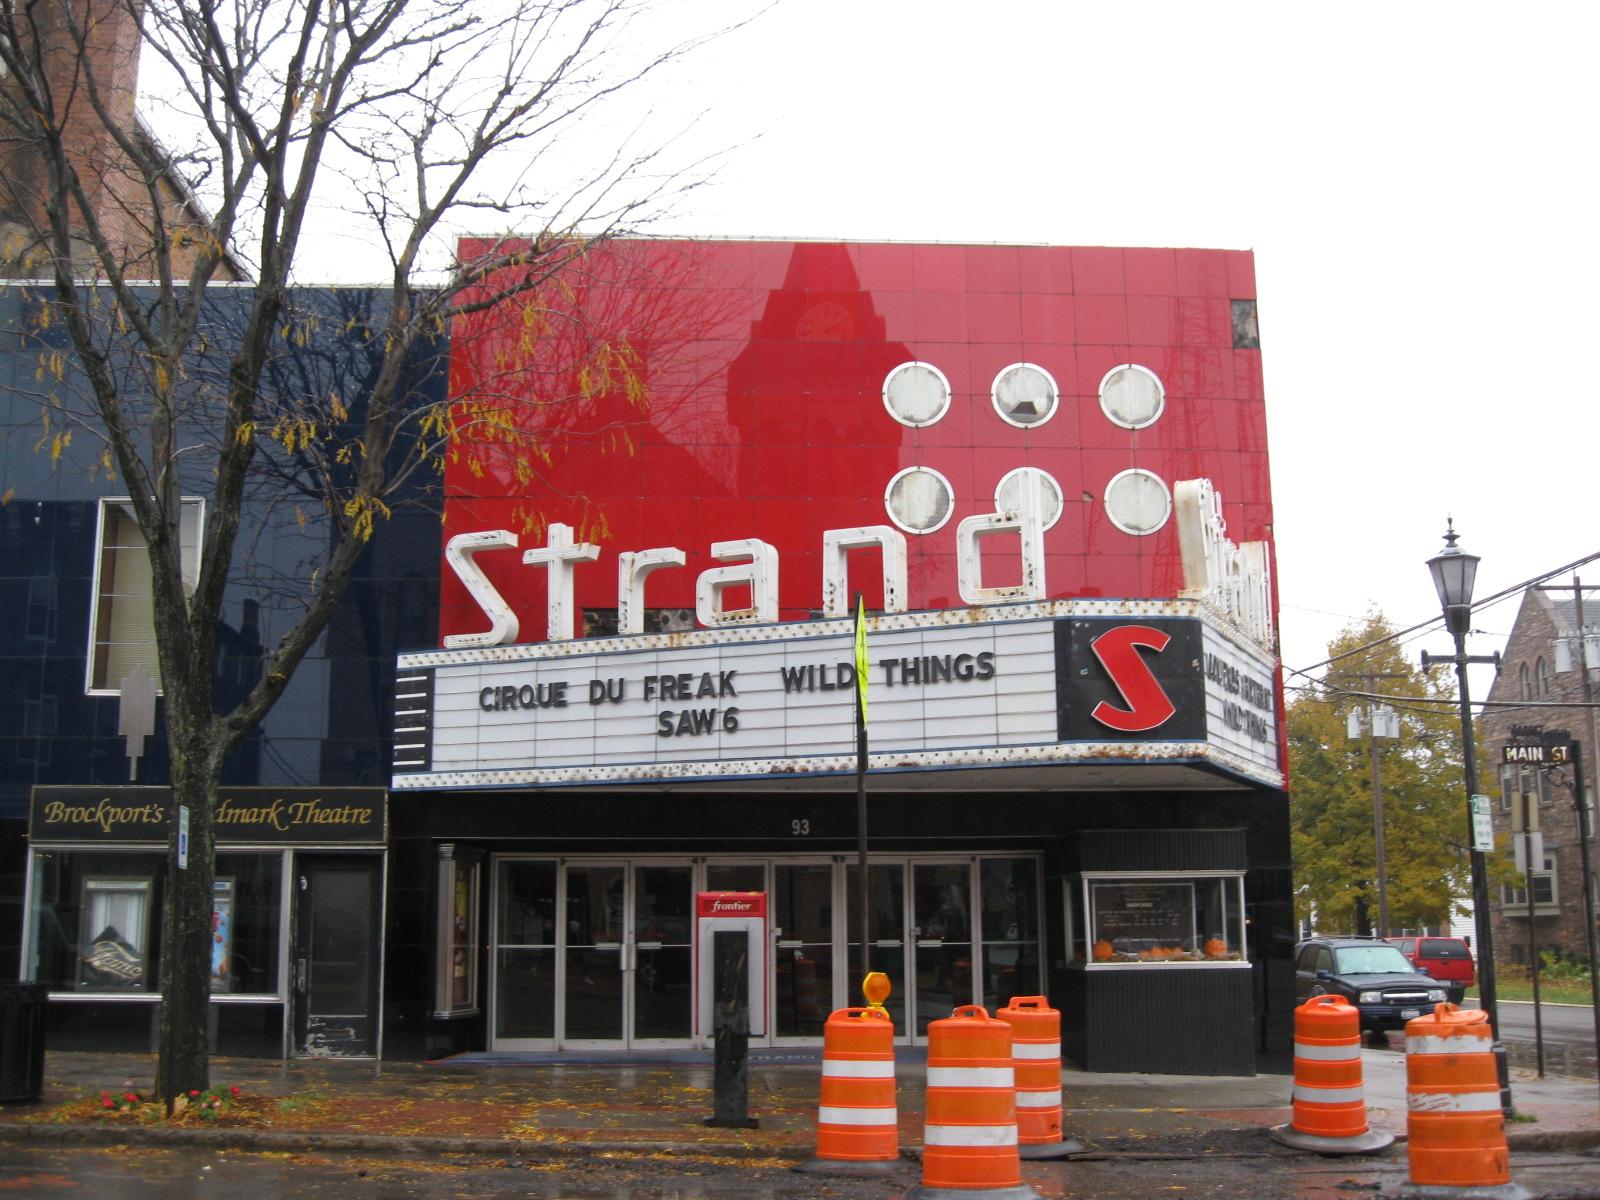 File:Main Street Historic District Brockport NY Strand Theater Octbrockport village